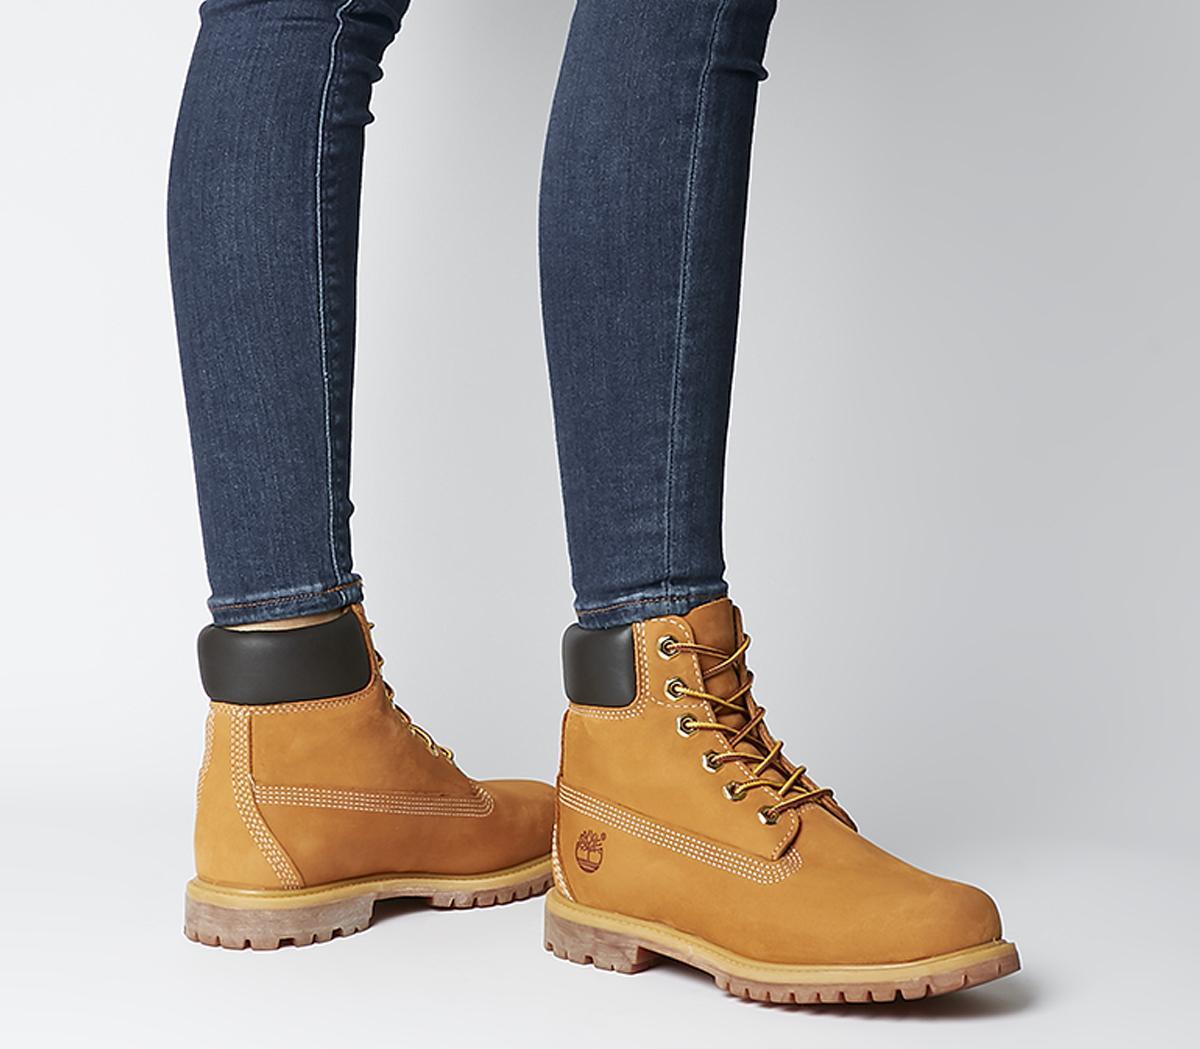 para jugar Para llevar polla  Timberland Premium 6 Boots Wheat Nubuck - Ankle Boots